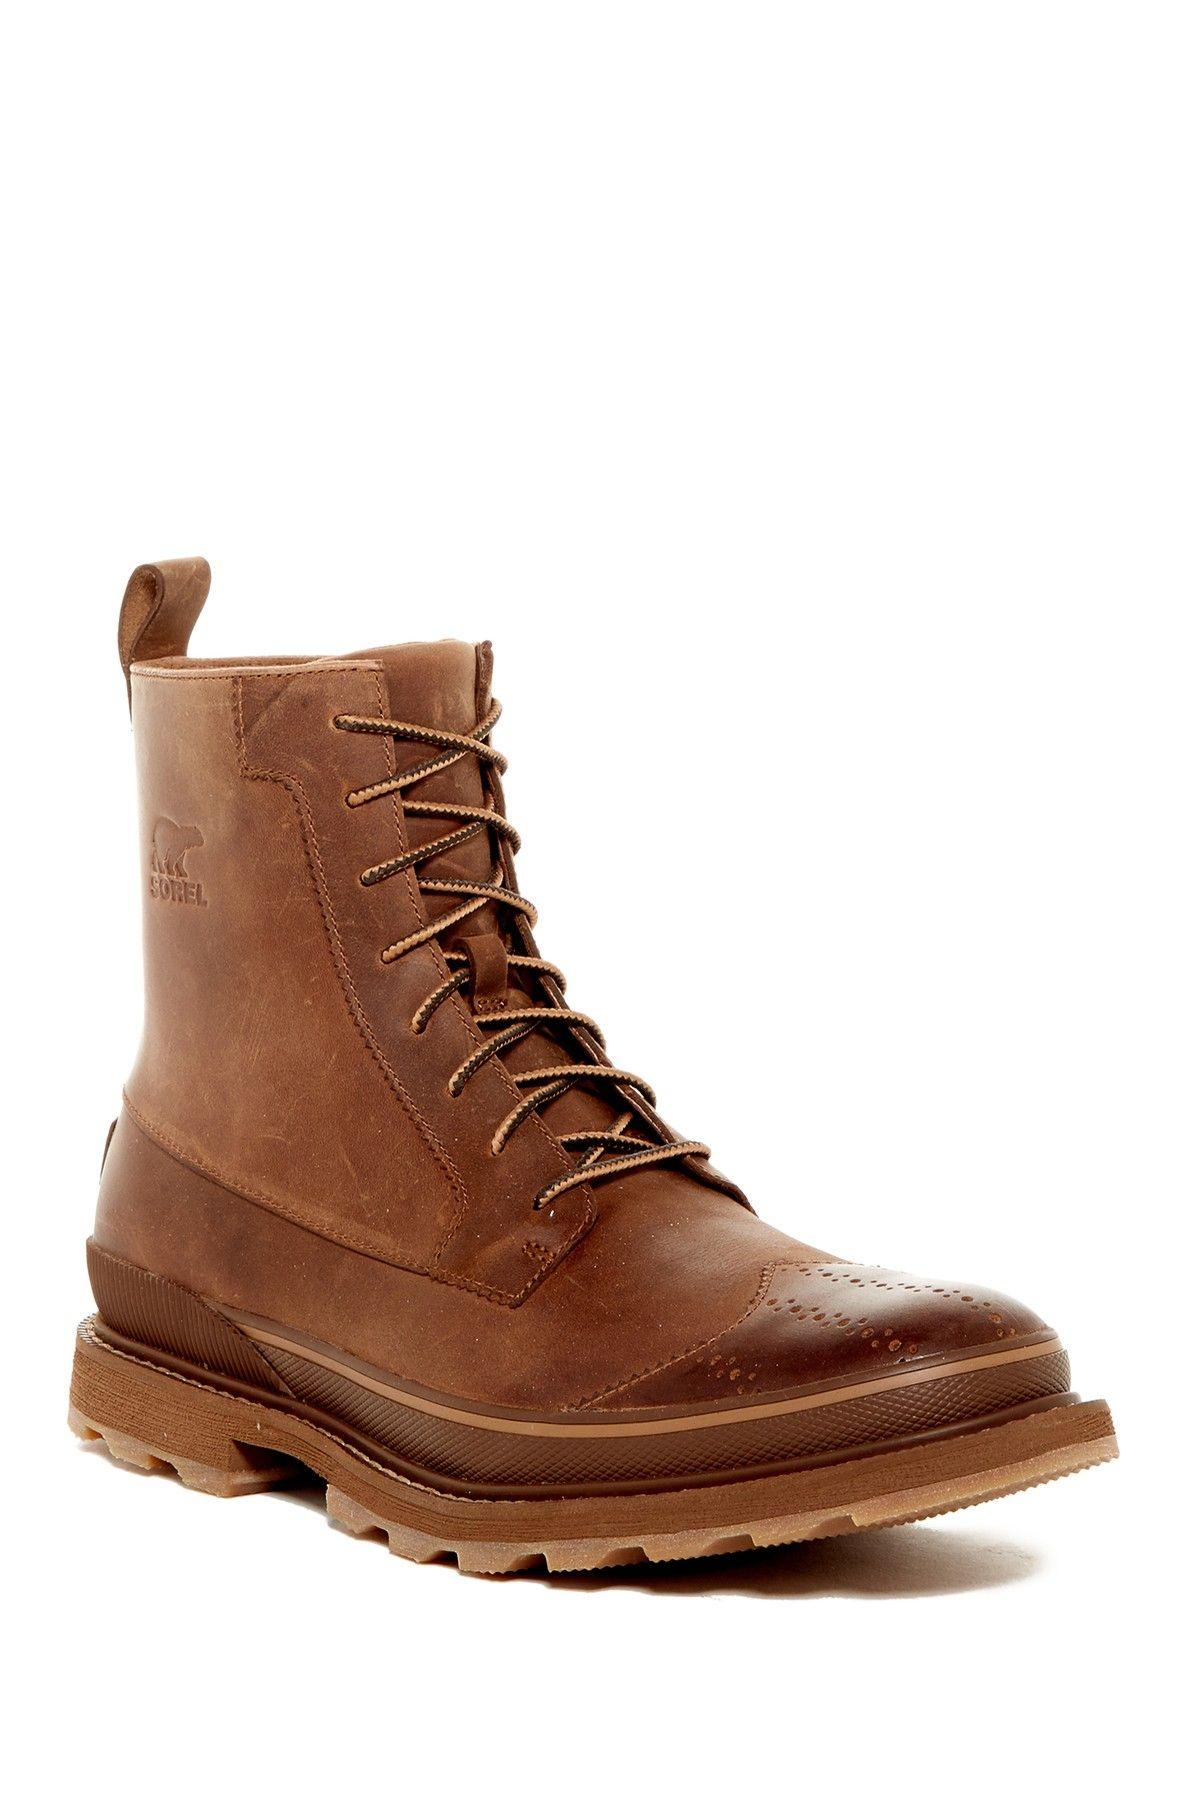 Sorel Mens Madson Wingtip Boot